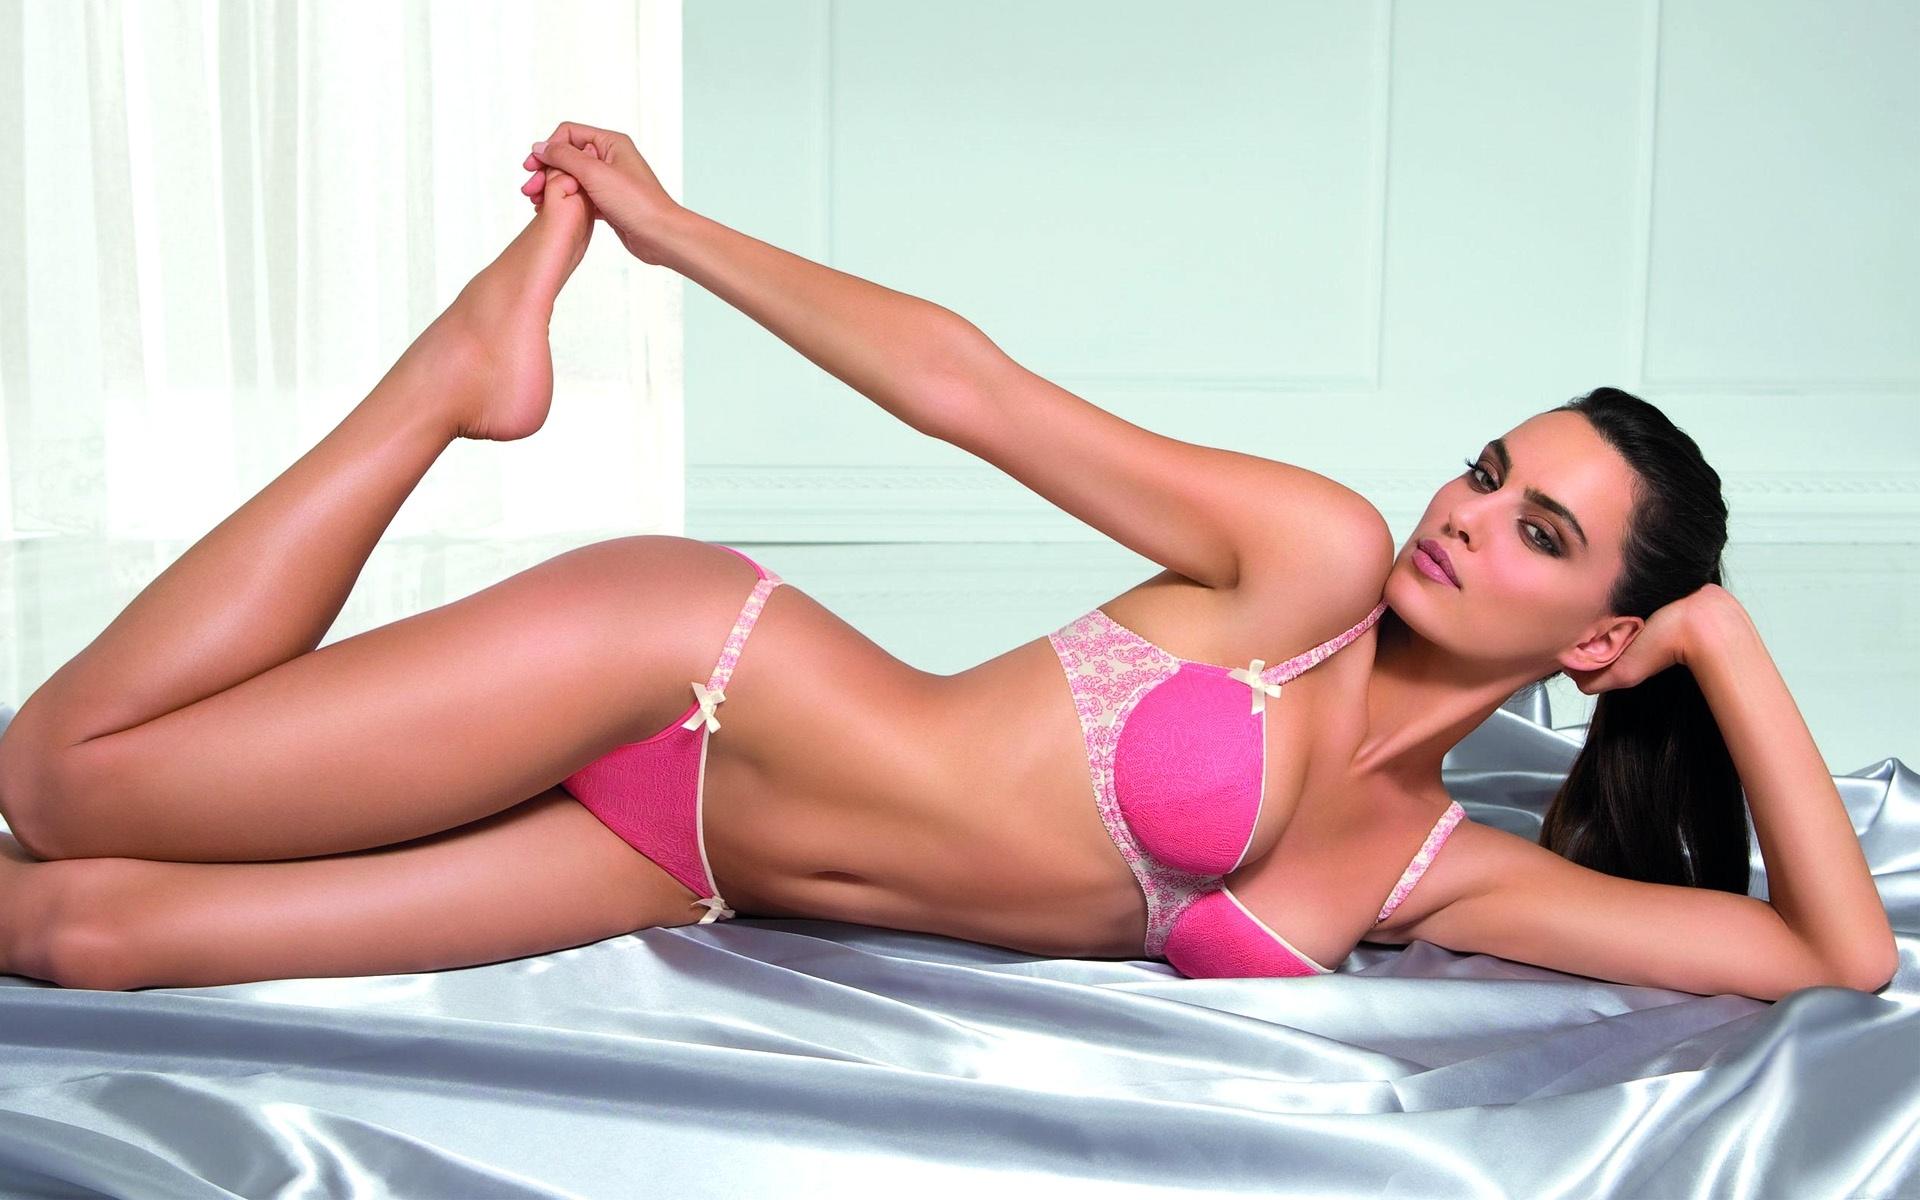 super-model-lingerie-bikini-q-pictures